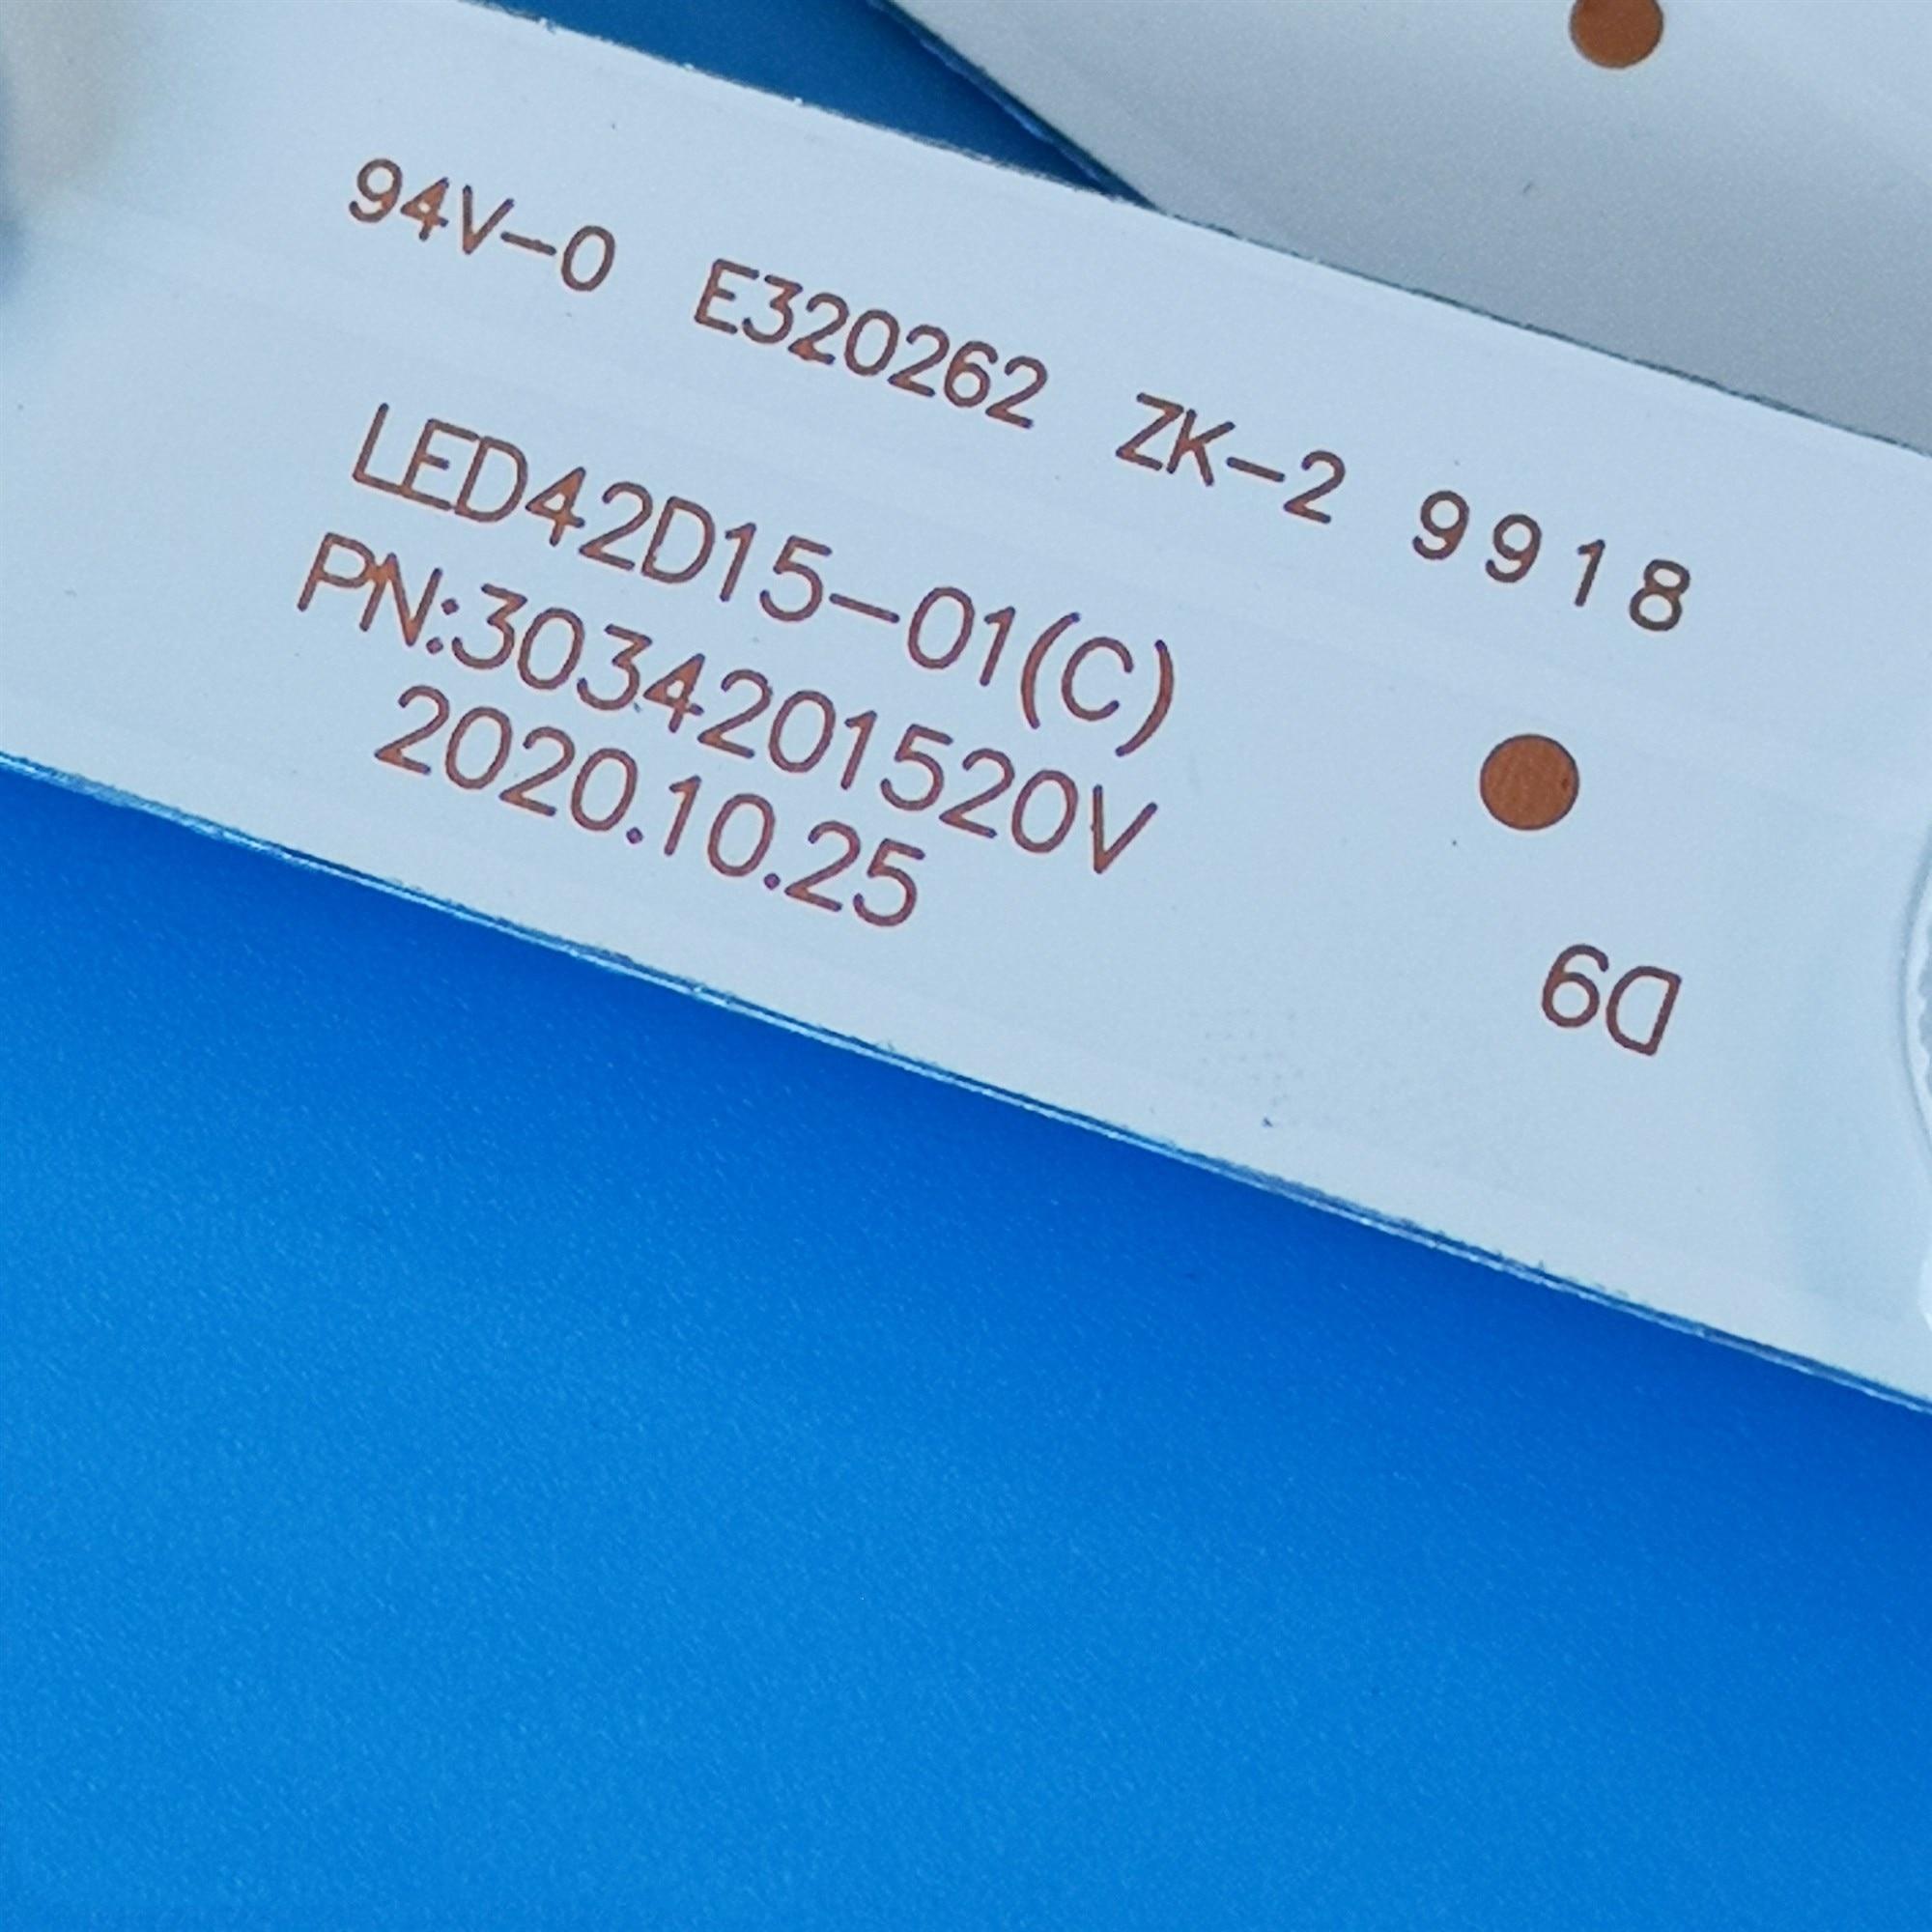 40pcs LED Backlight strip  LED42D15-01(C) 01(A) For LS42K5500 LE42B510F LS42H6000 42CE3210D LE42B8000TF LT-42UE76 LE42K50F enlarge